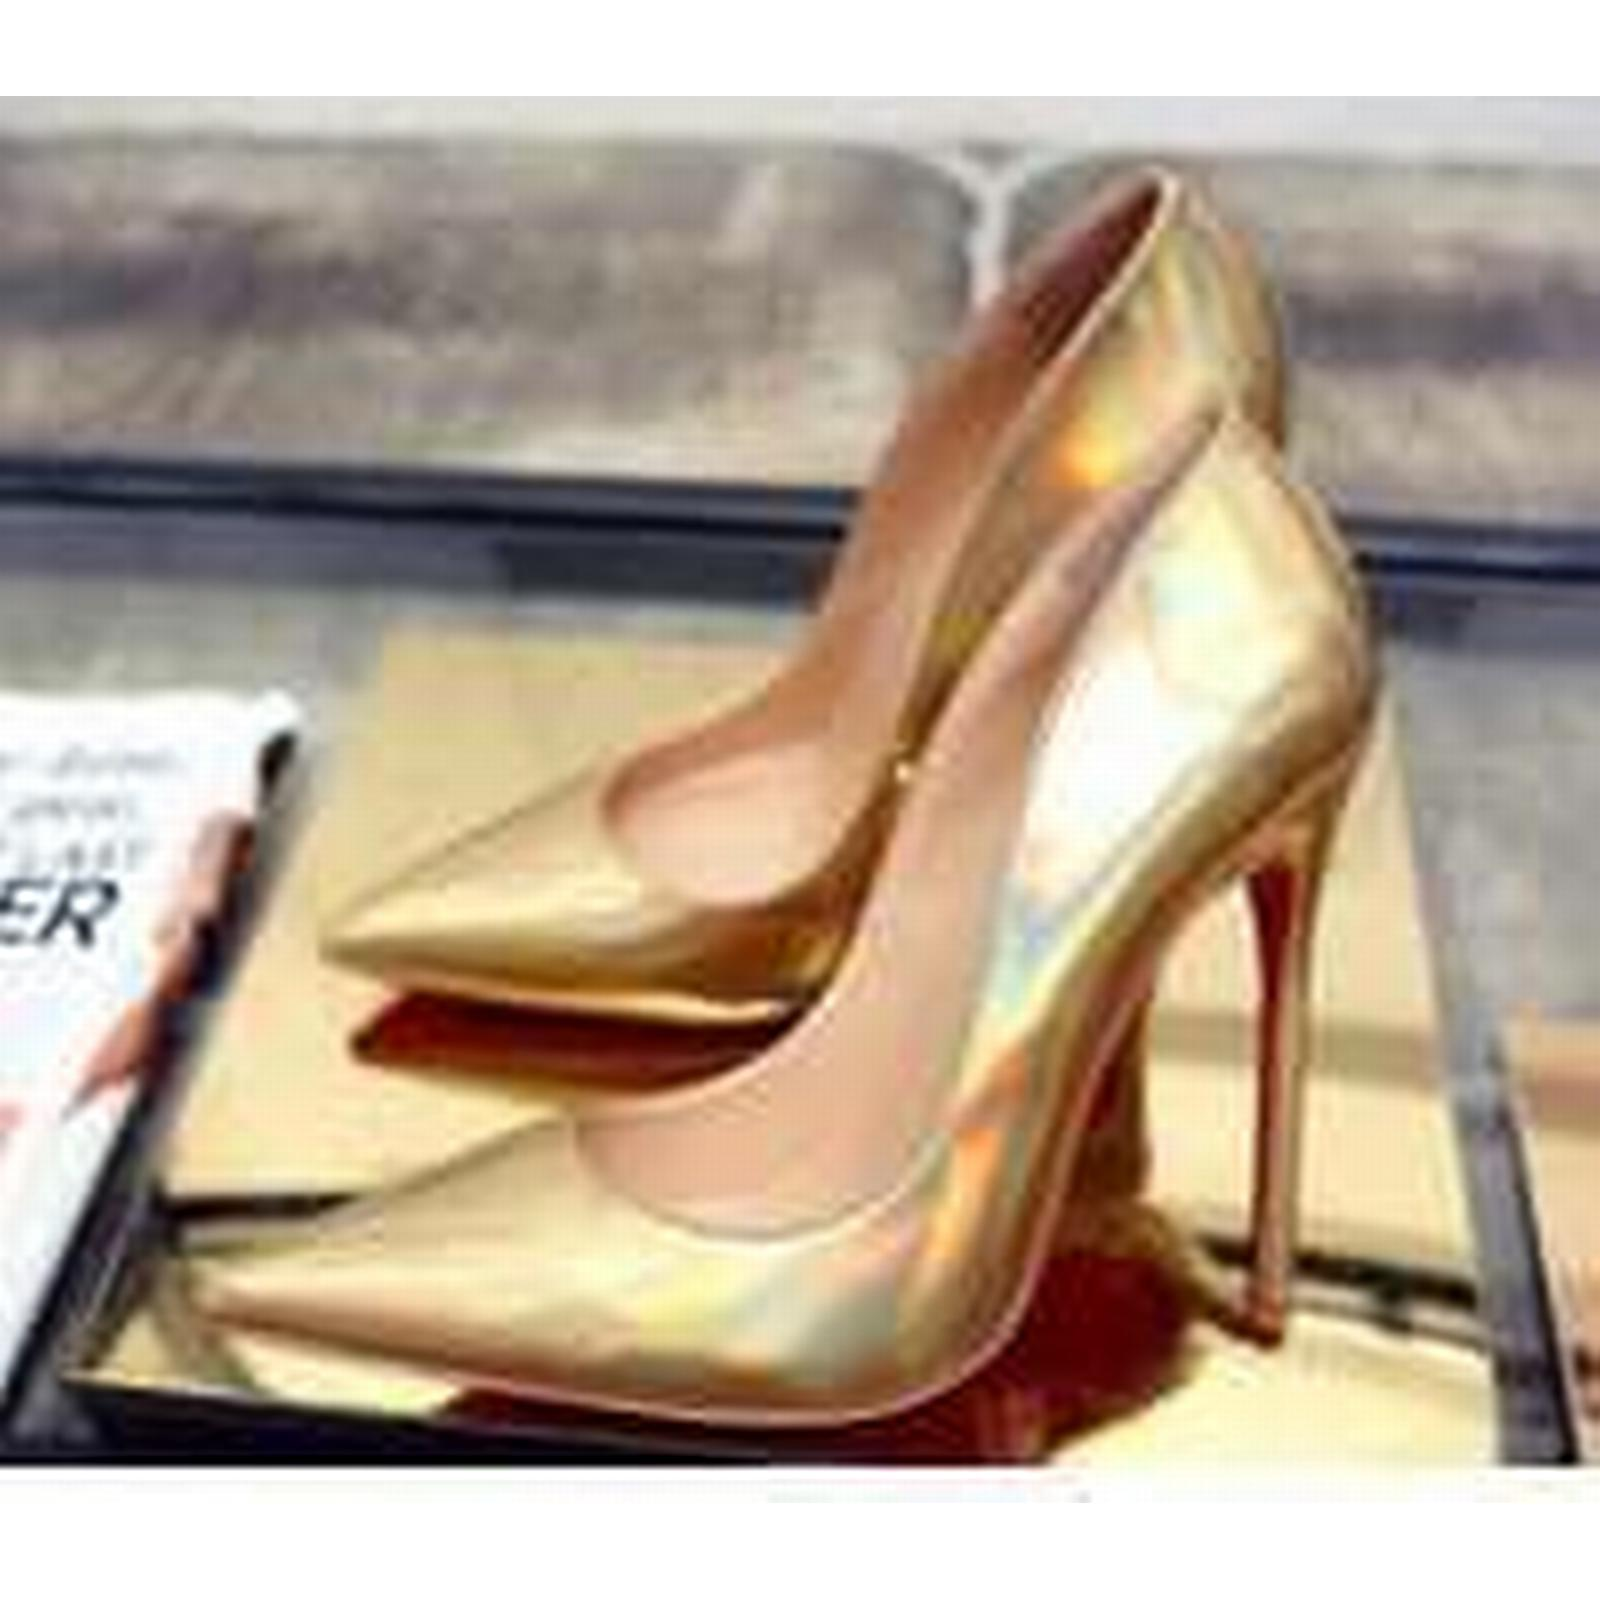 Bonanza (Global) heeled pp364 awesome supper high heeled (Global) pump,US Size 4-10, gold 73a01f